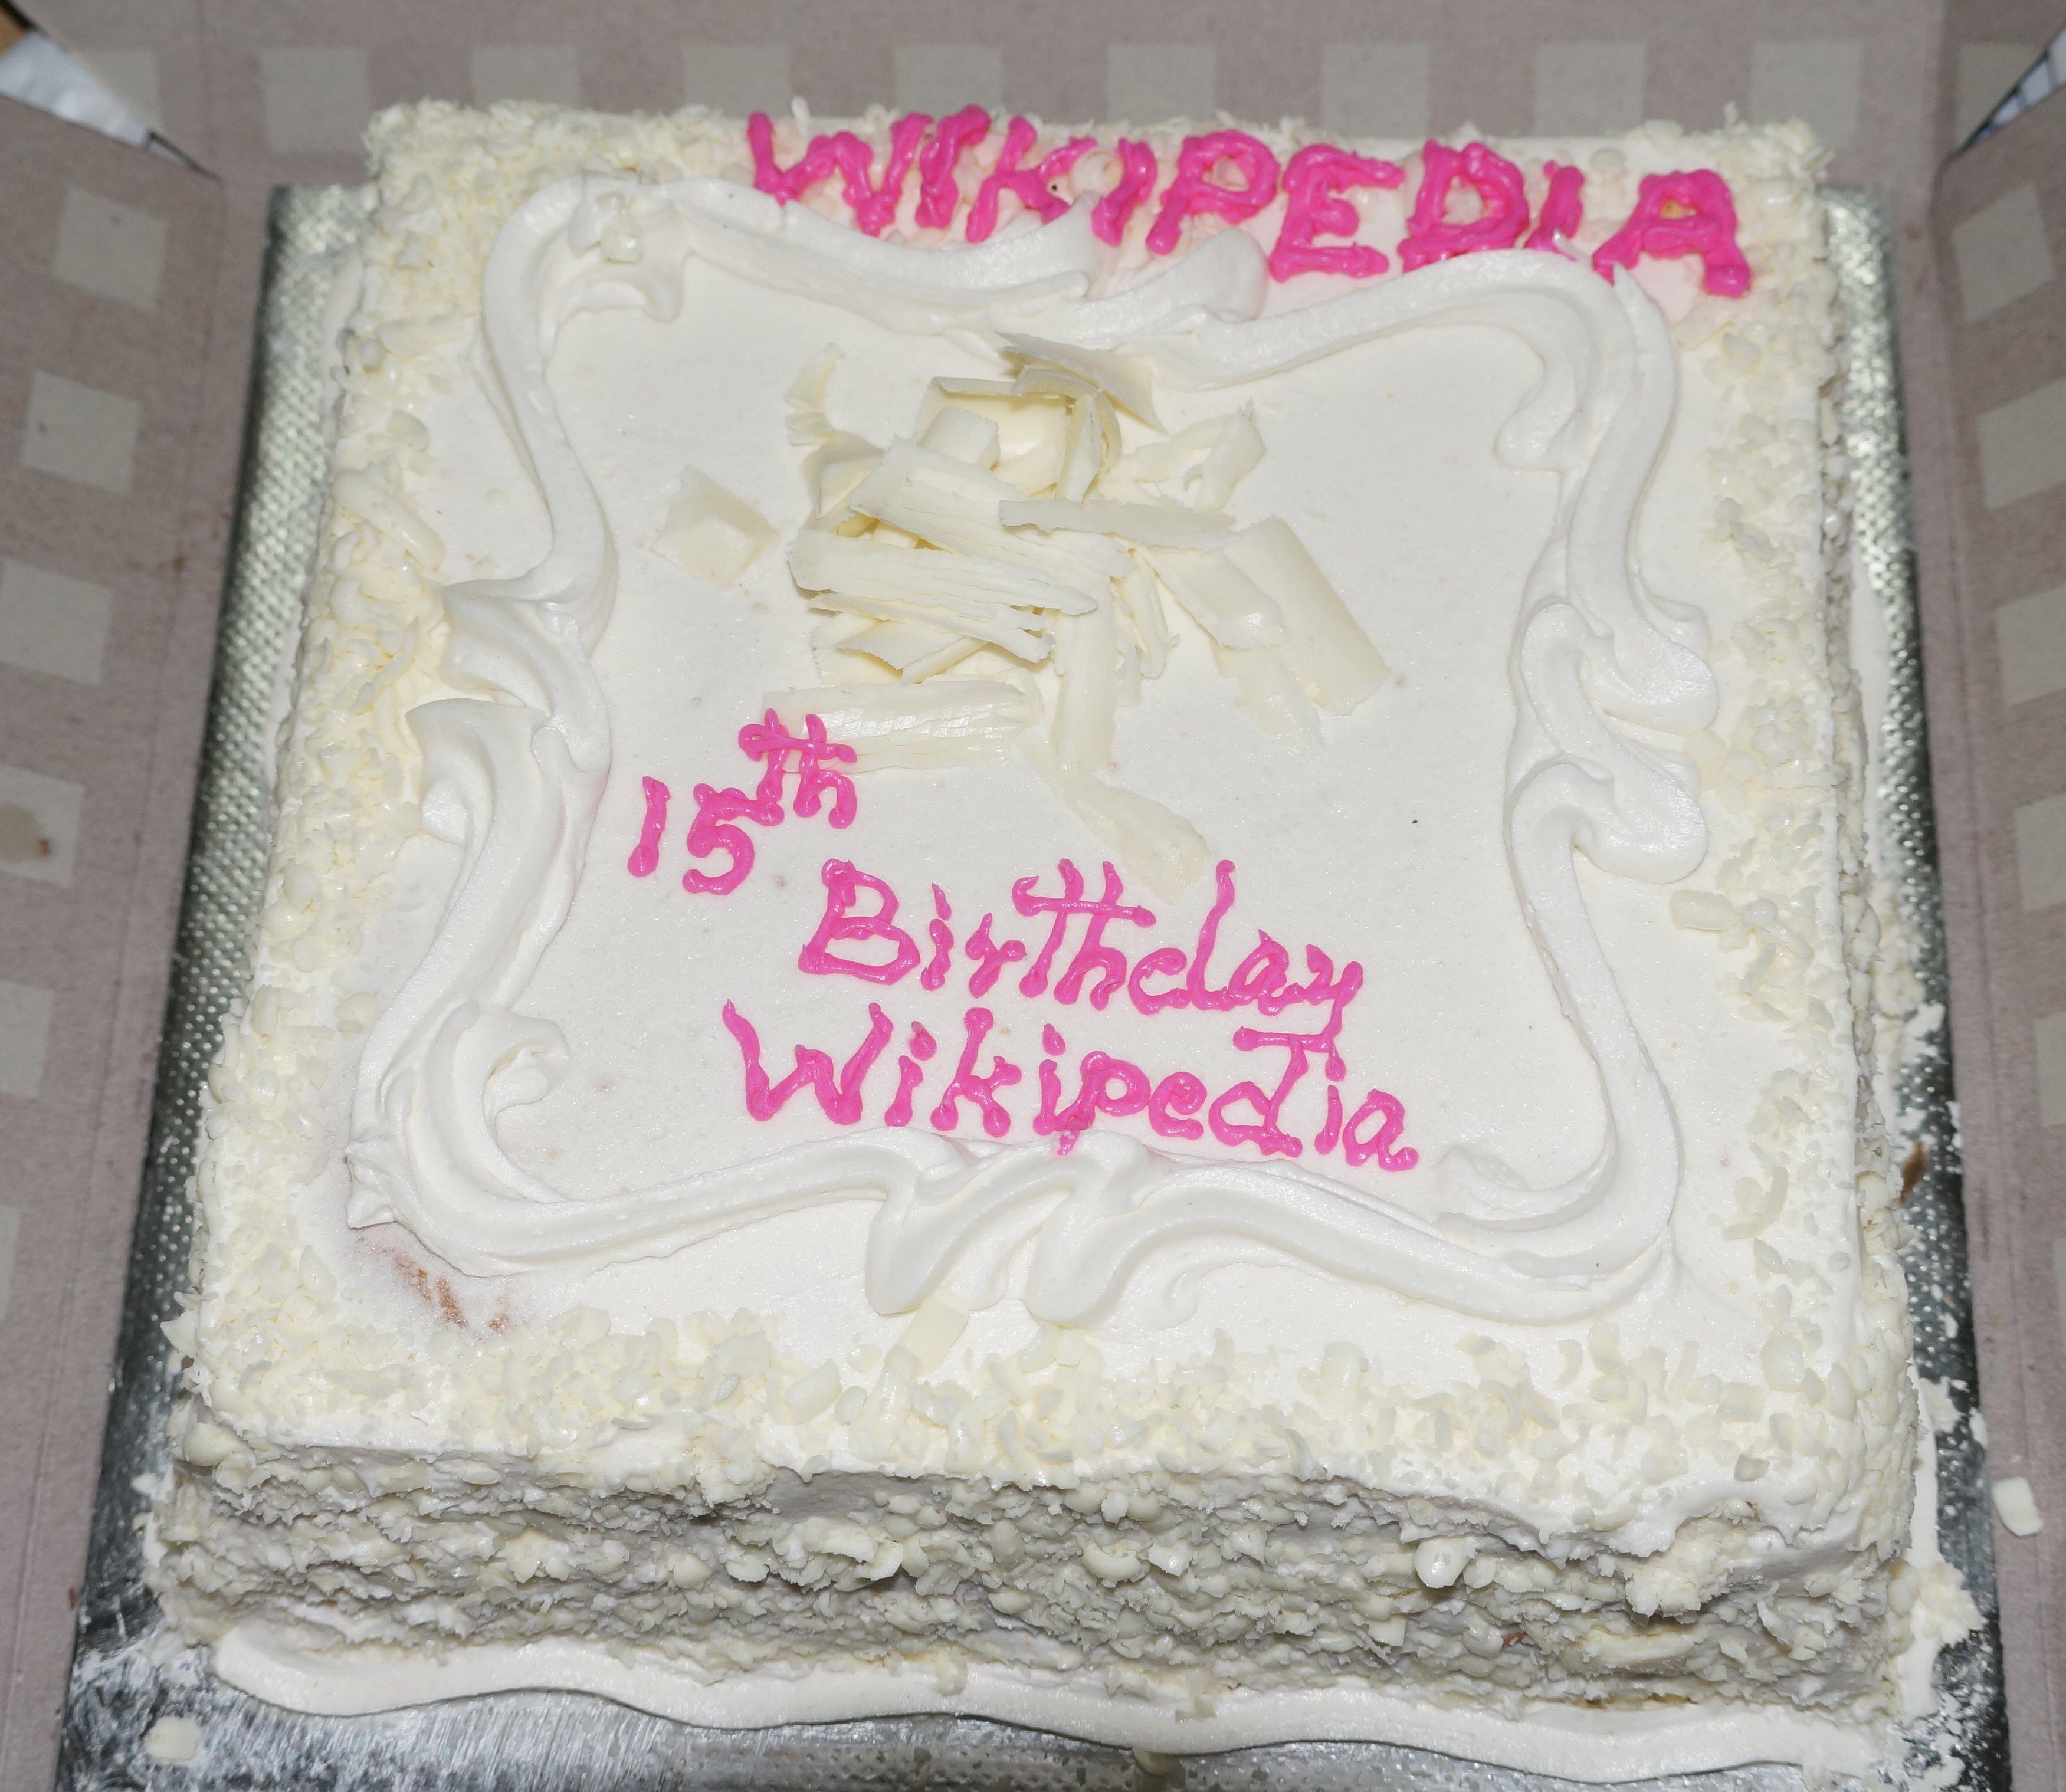 Astonishing File 15 Birthday Cake Kottayam 21 12 17 Jpg Wikimedia Commons Funny Birthday Cards Online Inifofree Goldxyz